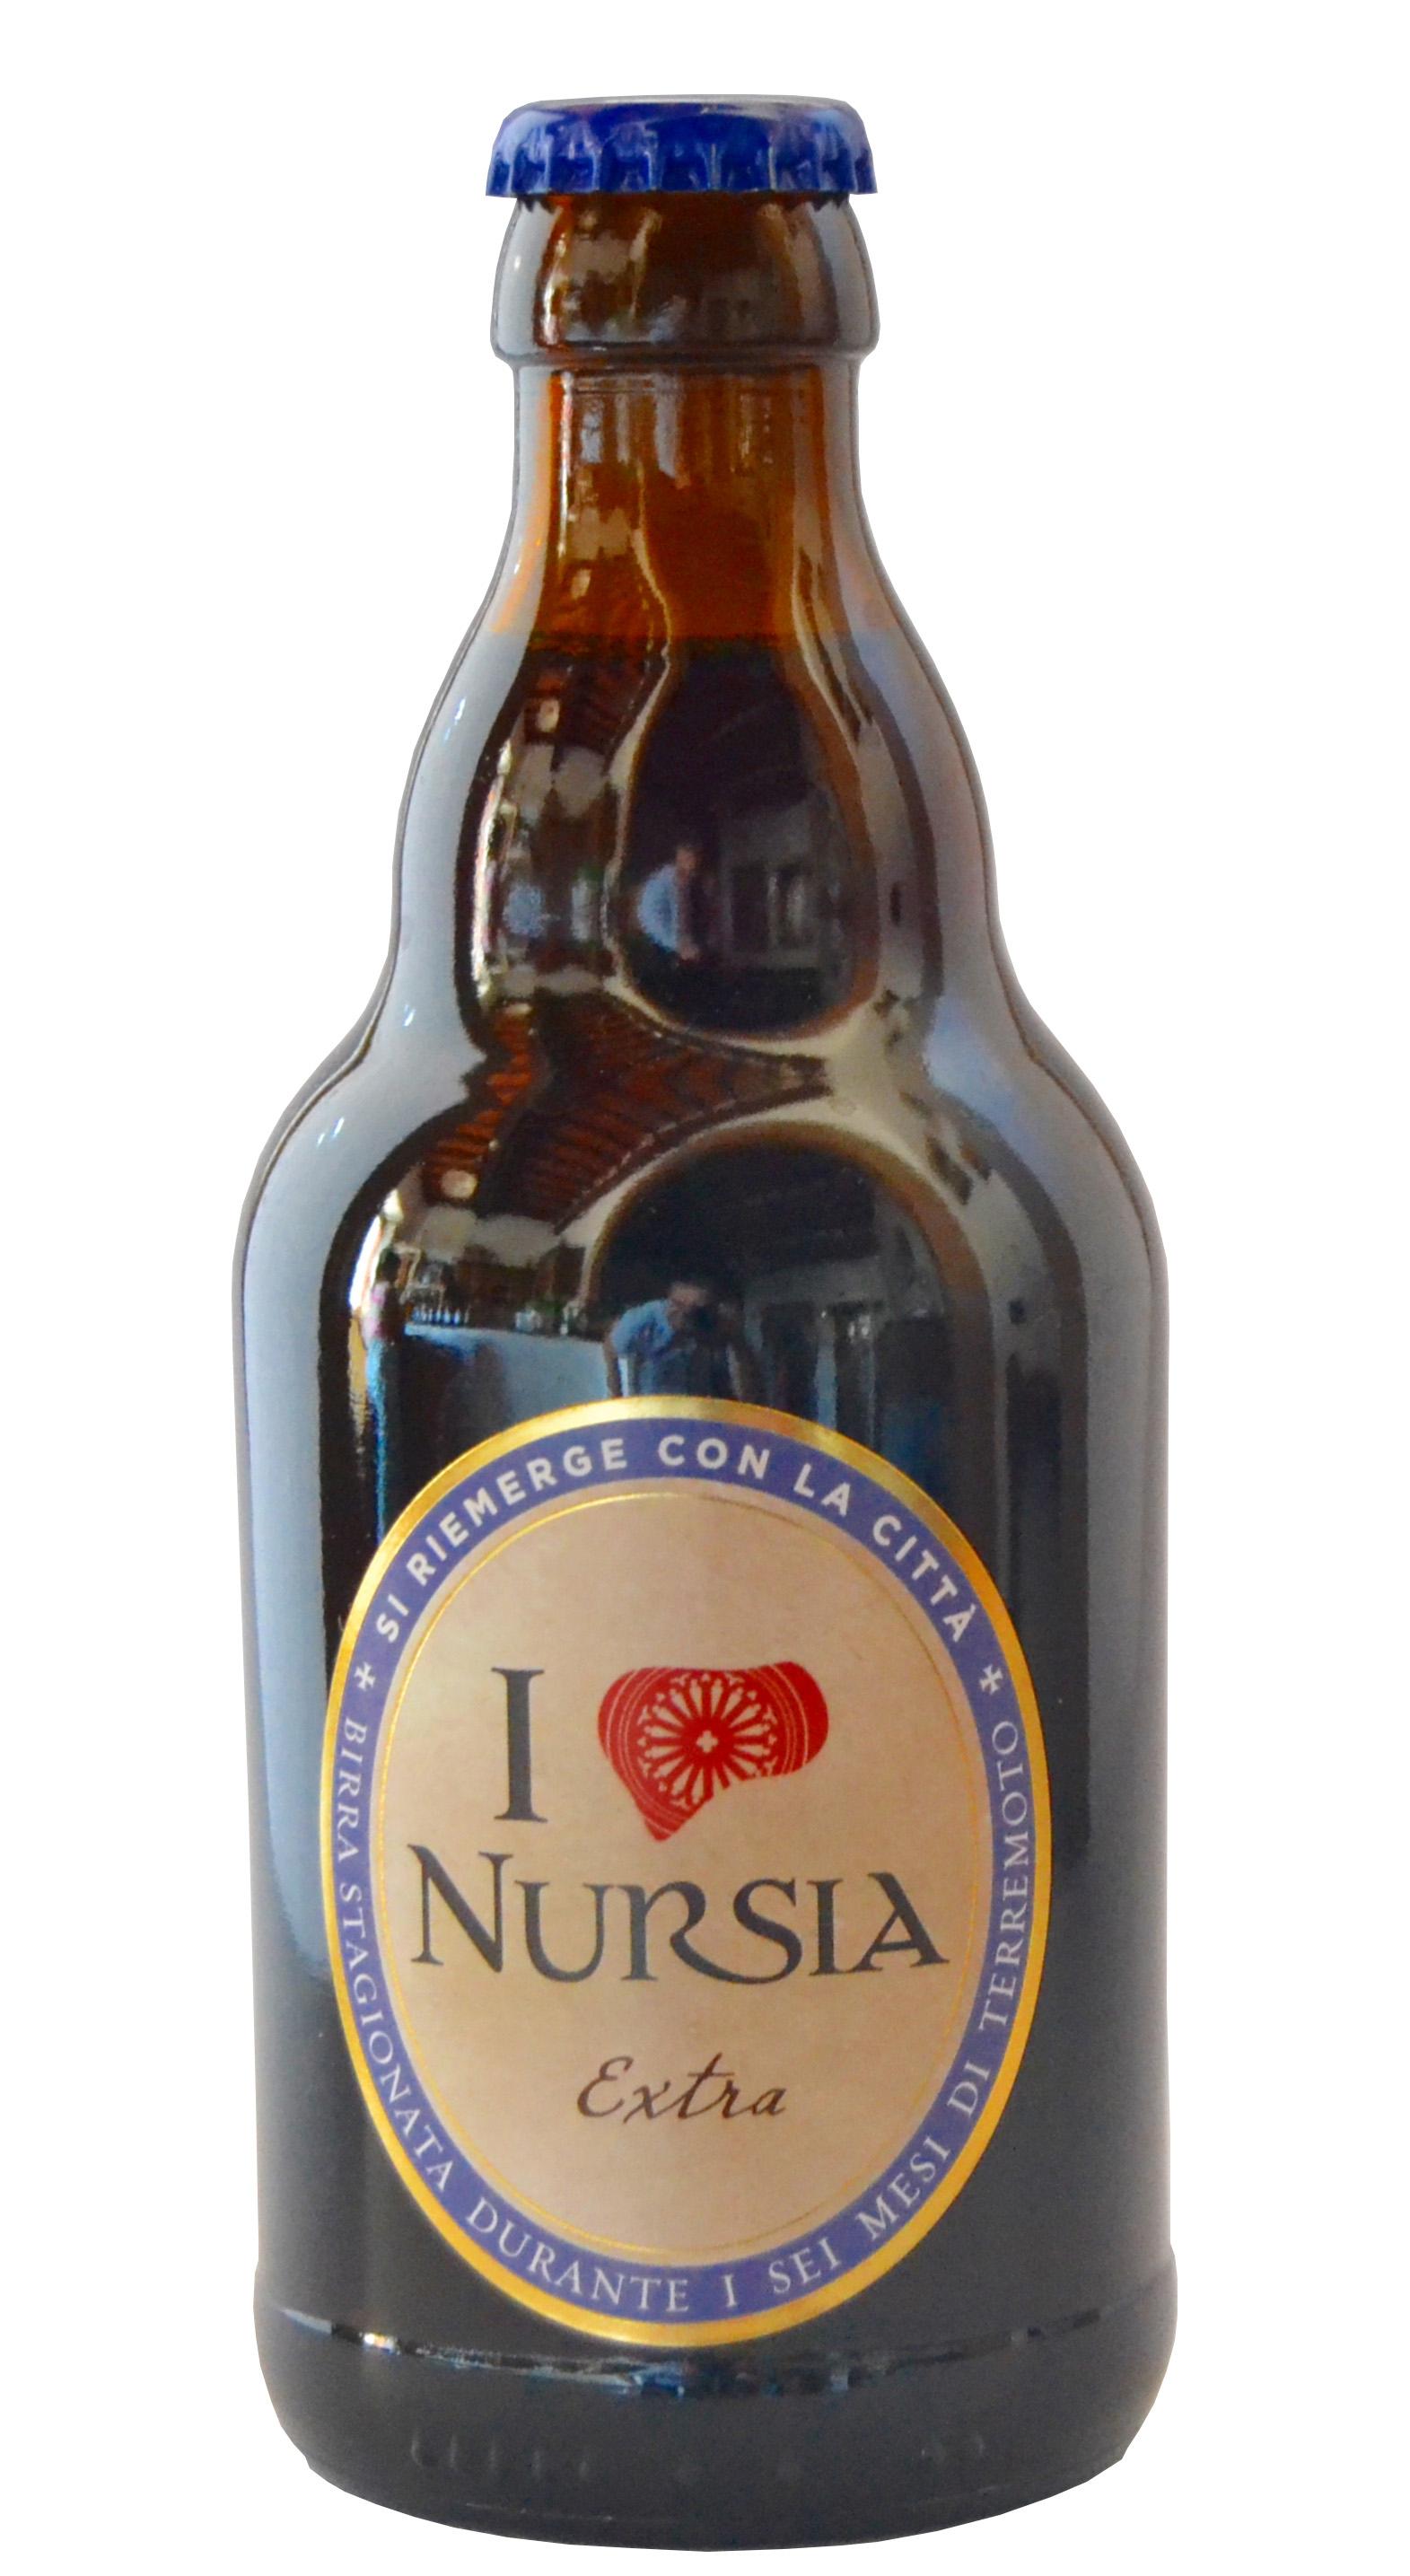 Extra dunkles Bier Nursia Flasche cl 33